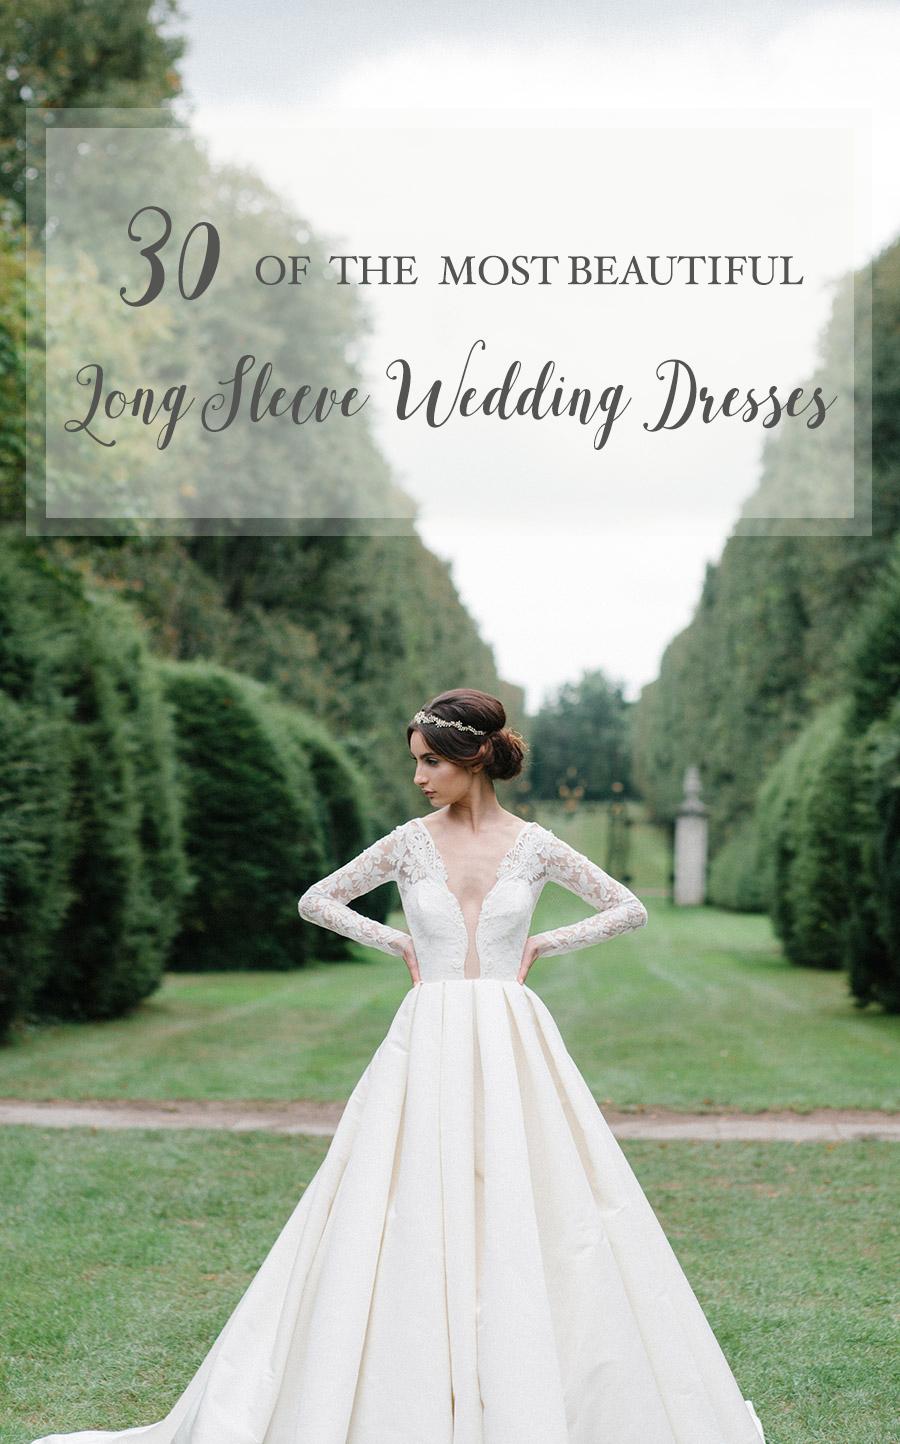 beautiful long sleeved wedding dresses sleeved wedding dresses 30 of the most Beautiful Long Sleeve Wedding Dresses for